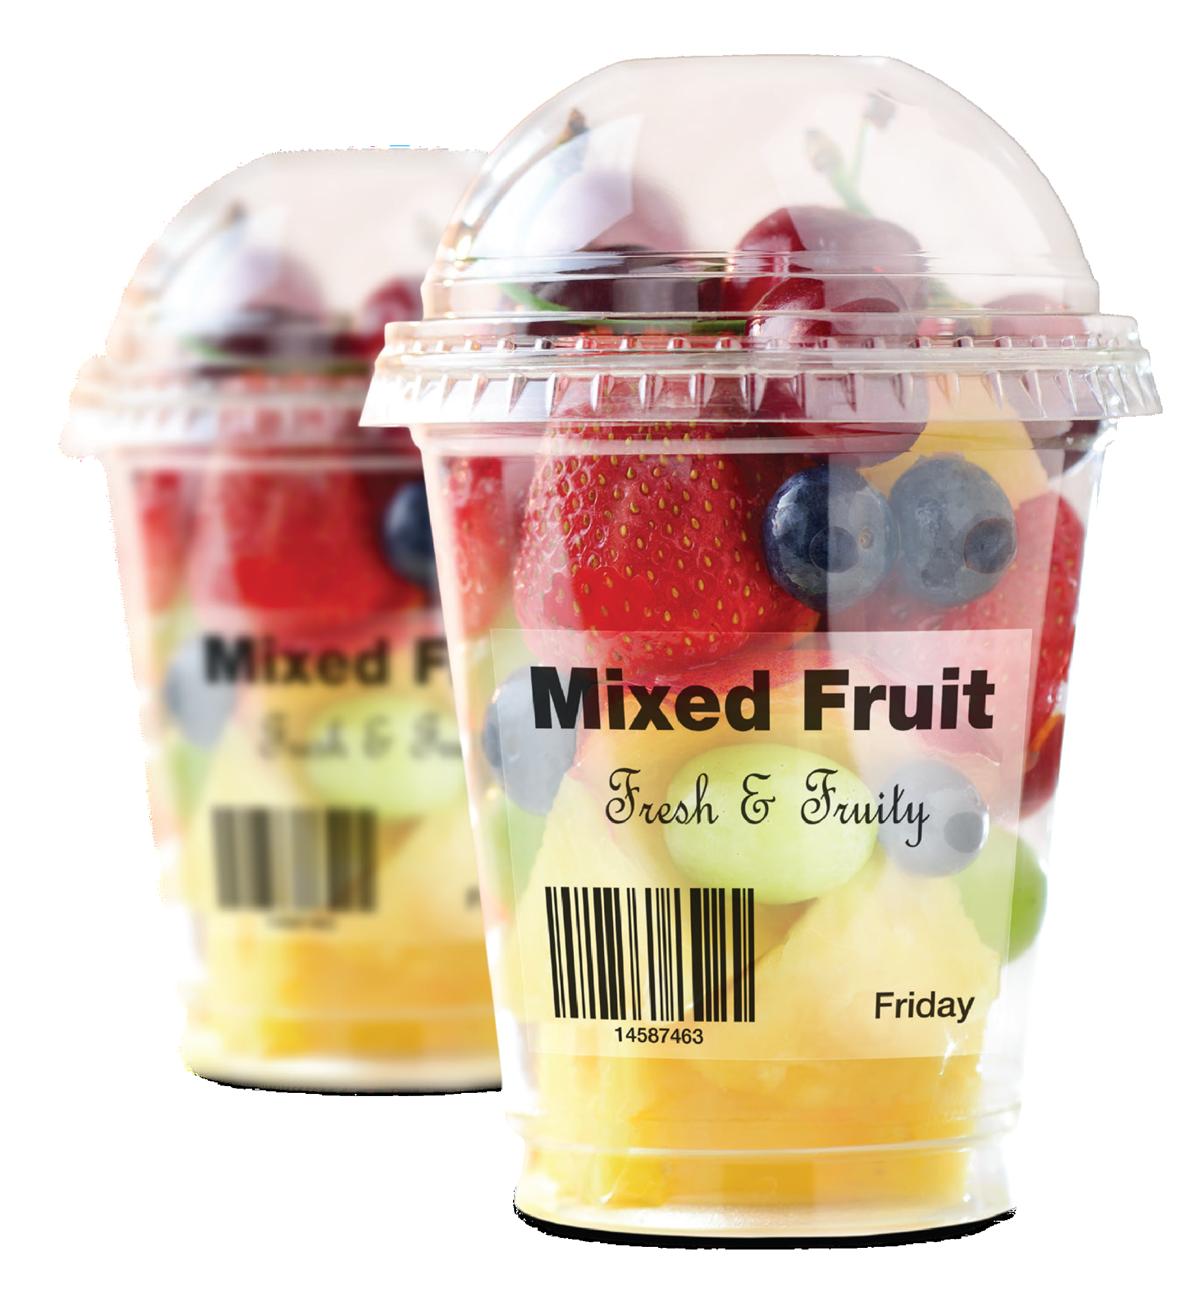 Mixed Fruit Label